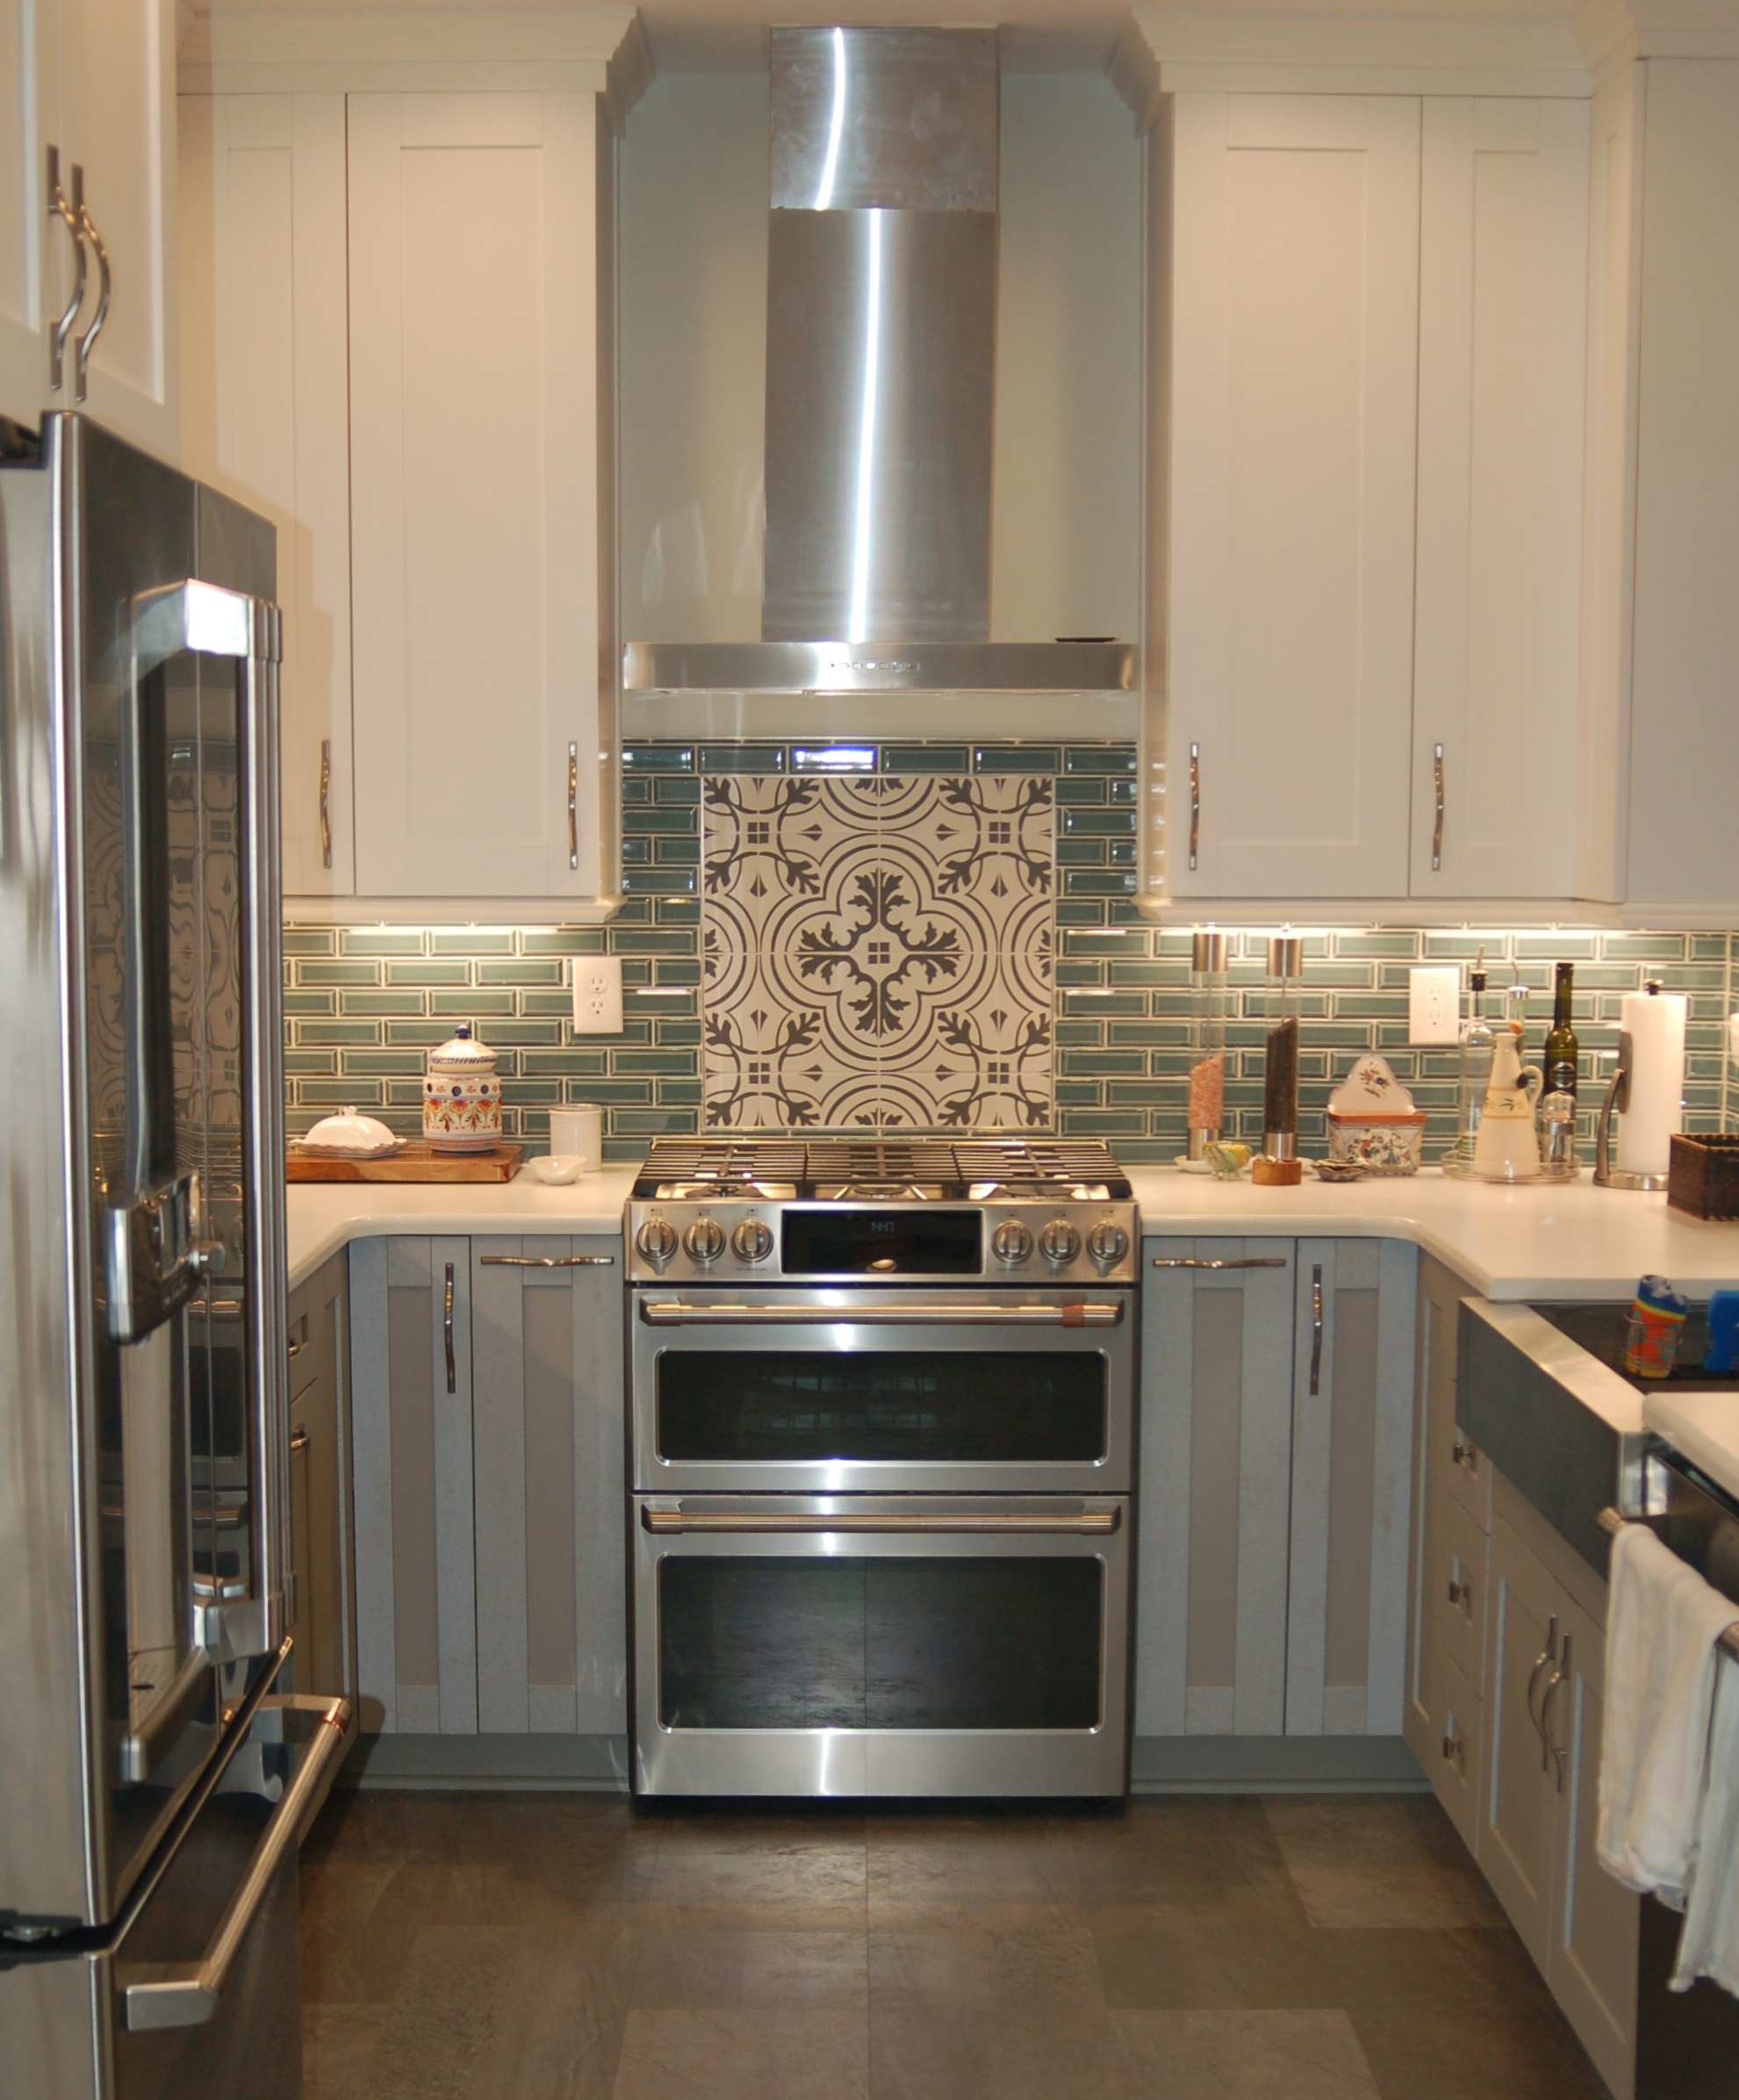 - Spangler Kitchen Remodel - Hatchett Design/Remodel